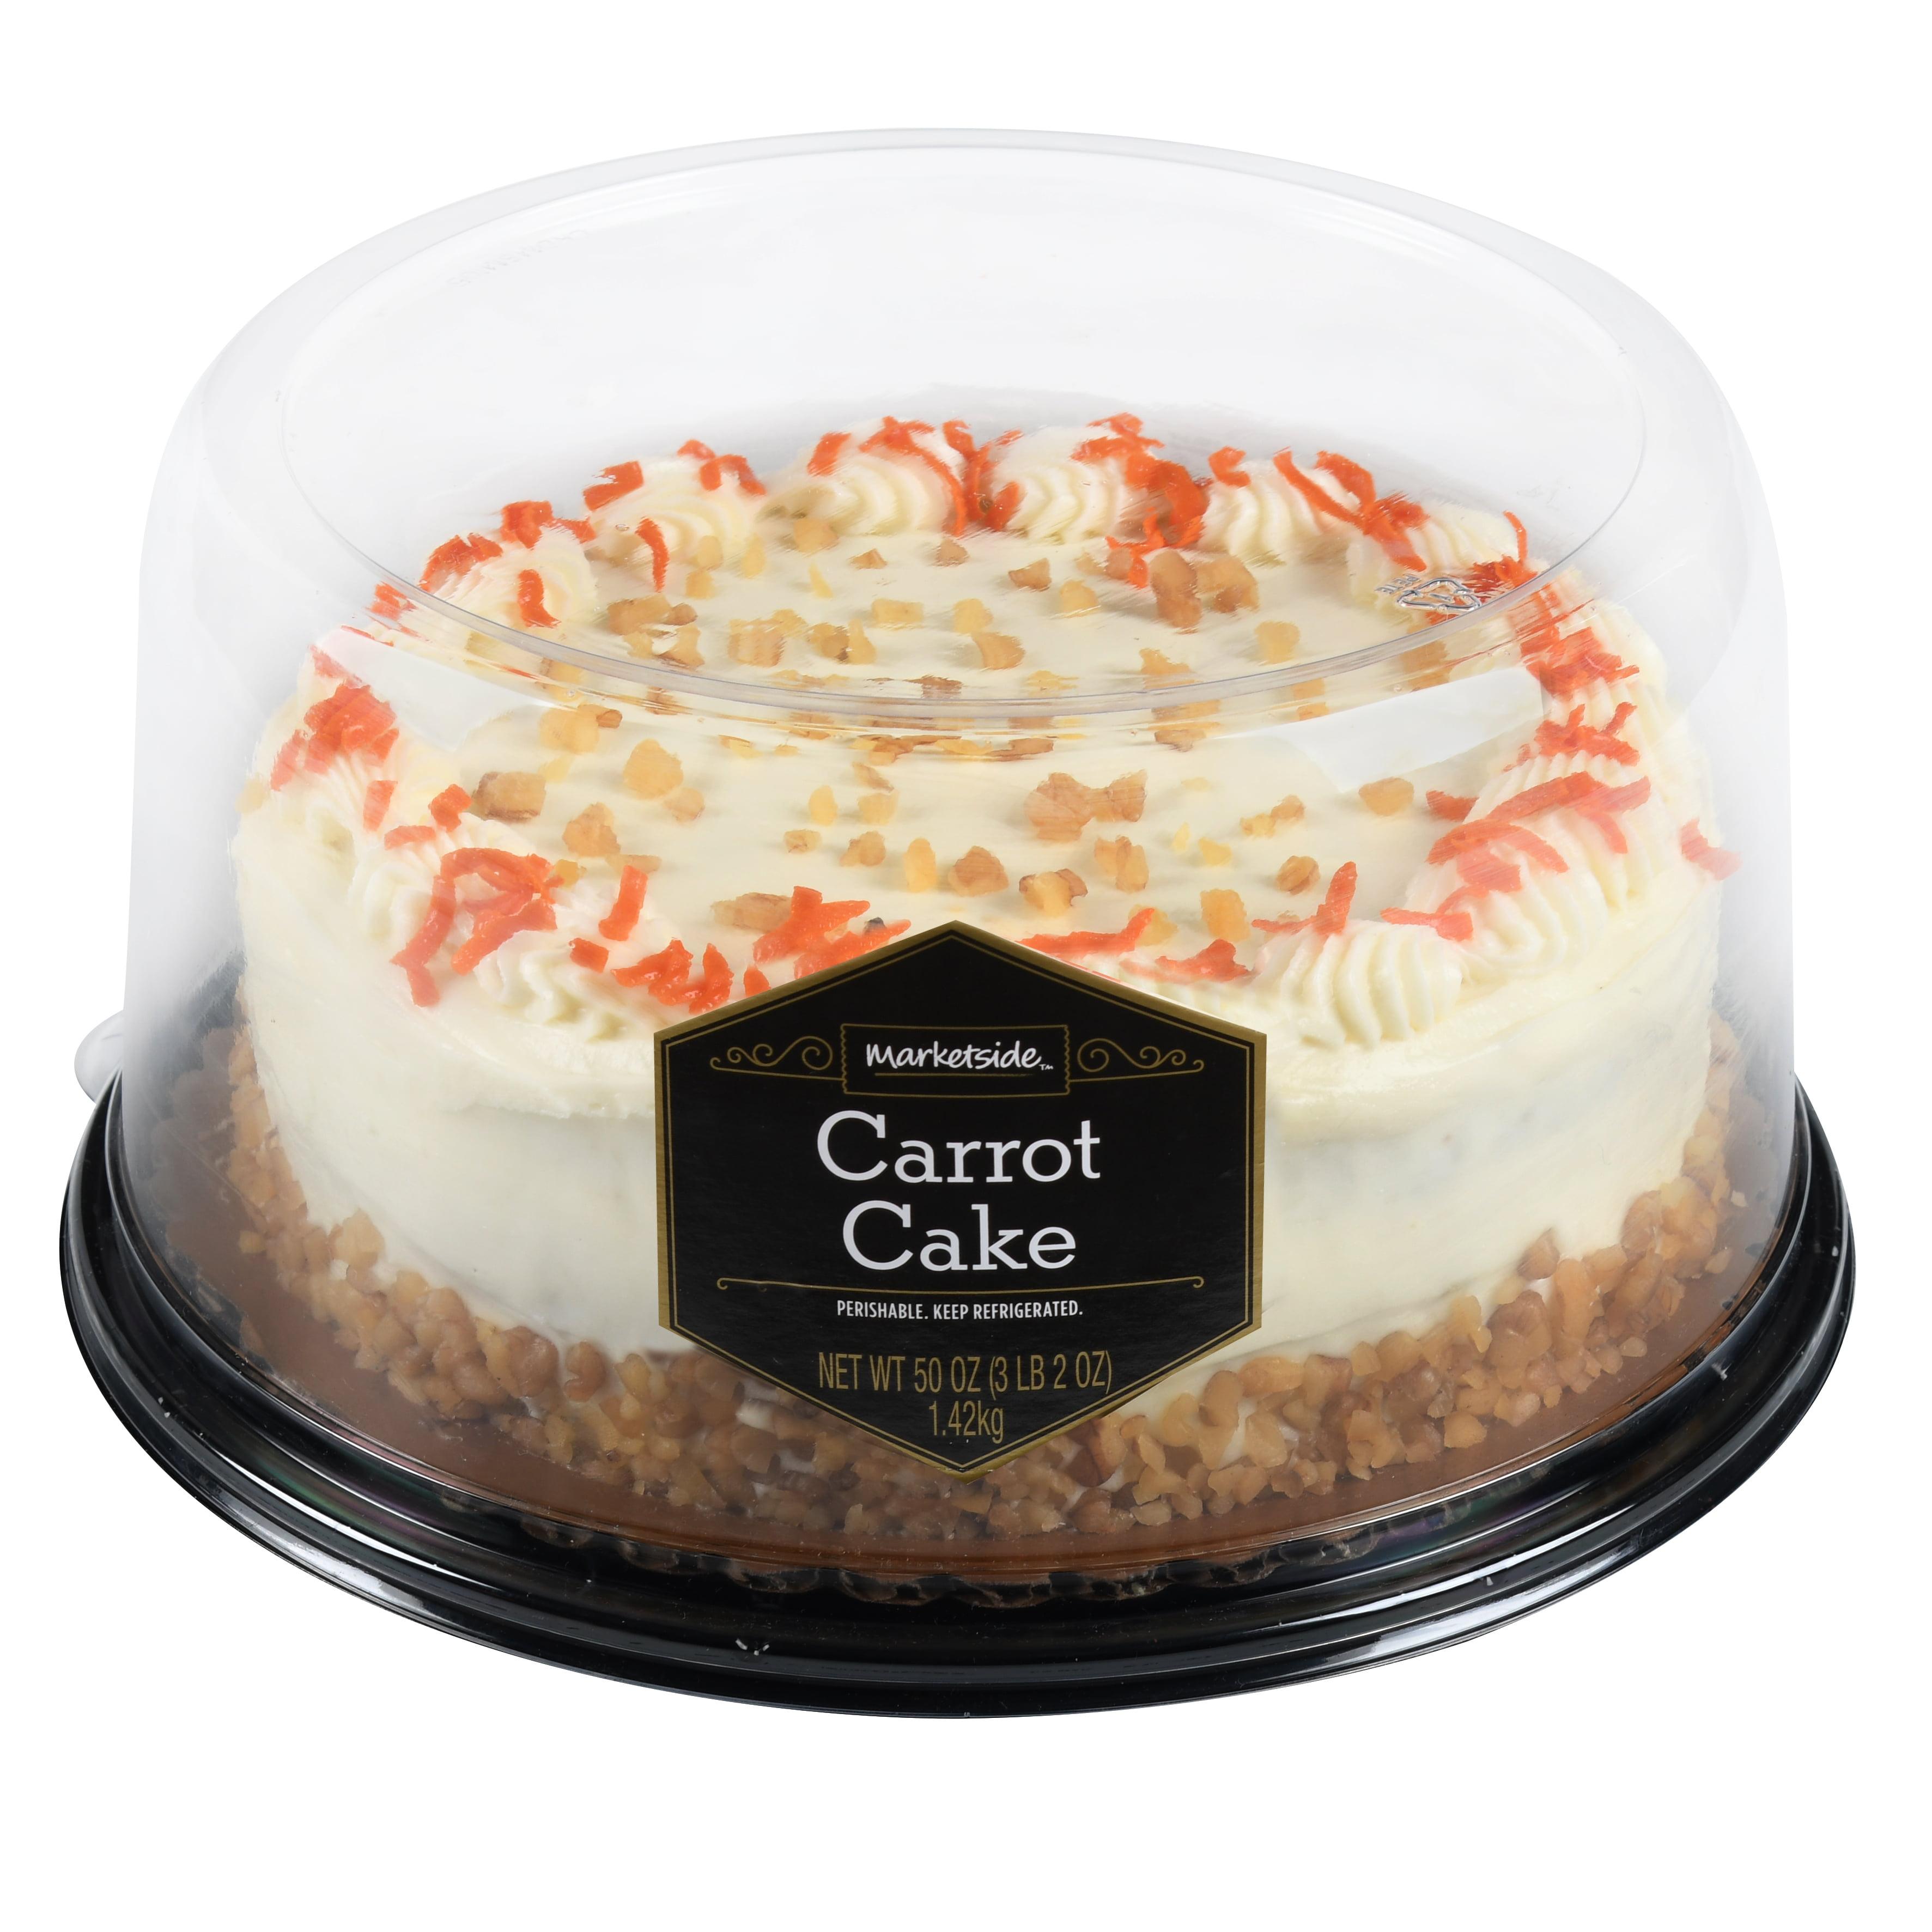 Marketside Carrot Cake 50 Oz Walmart